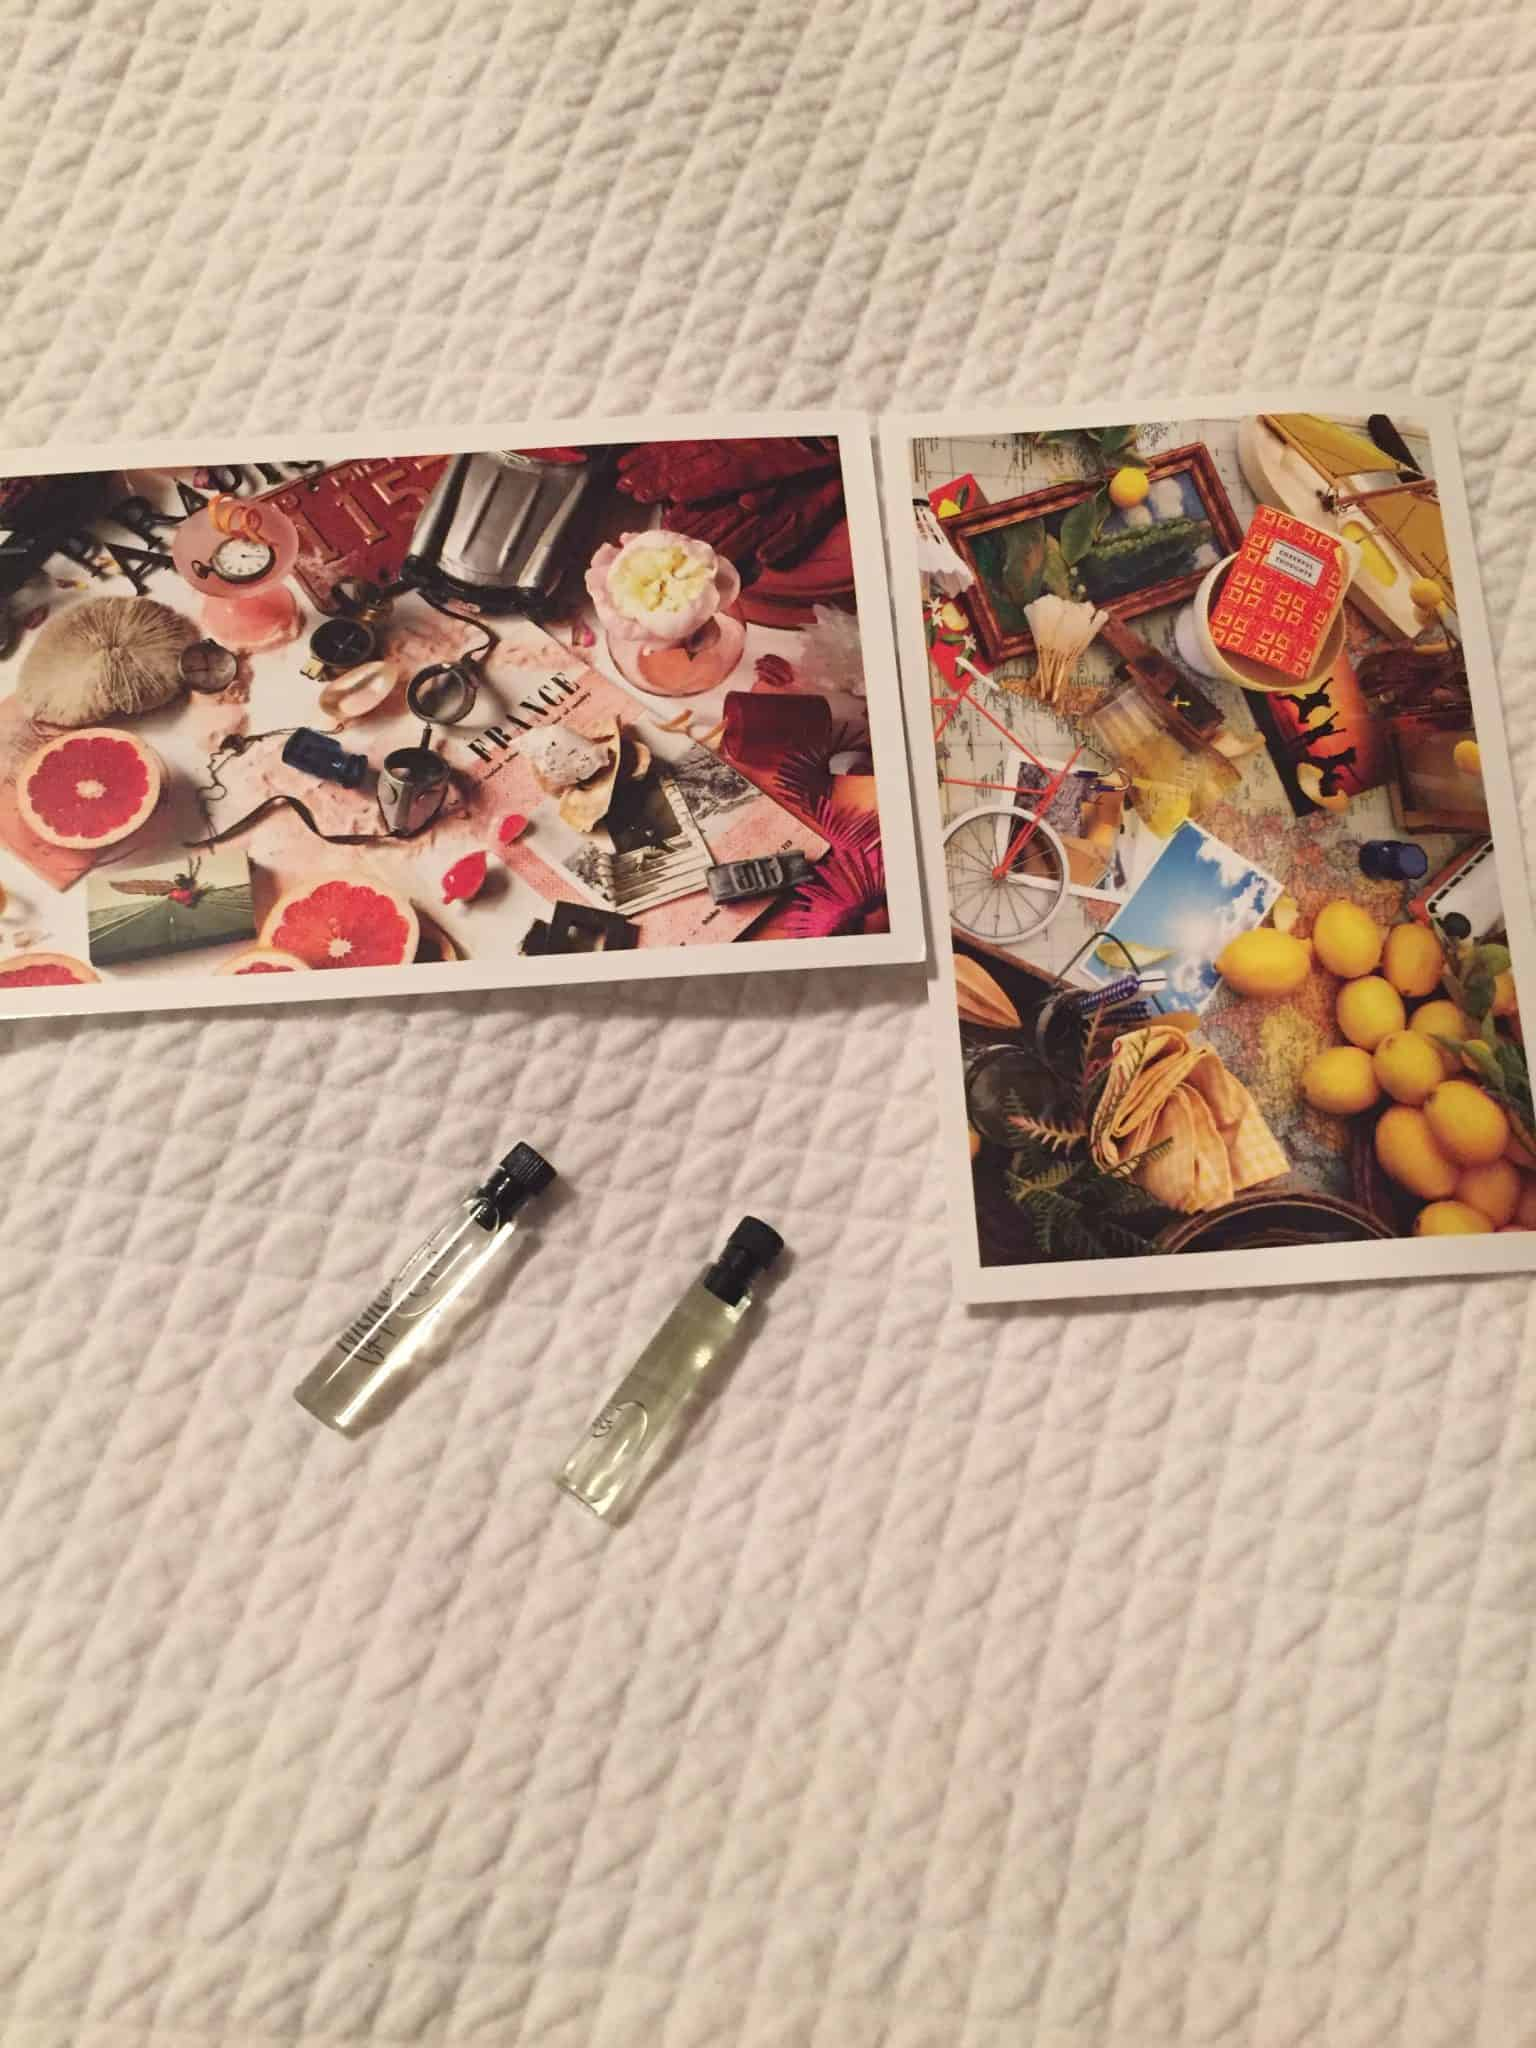 I Love Perfume!